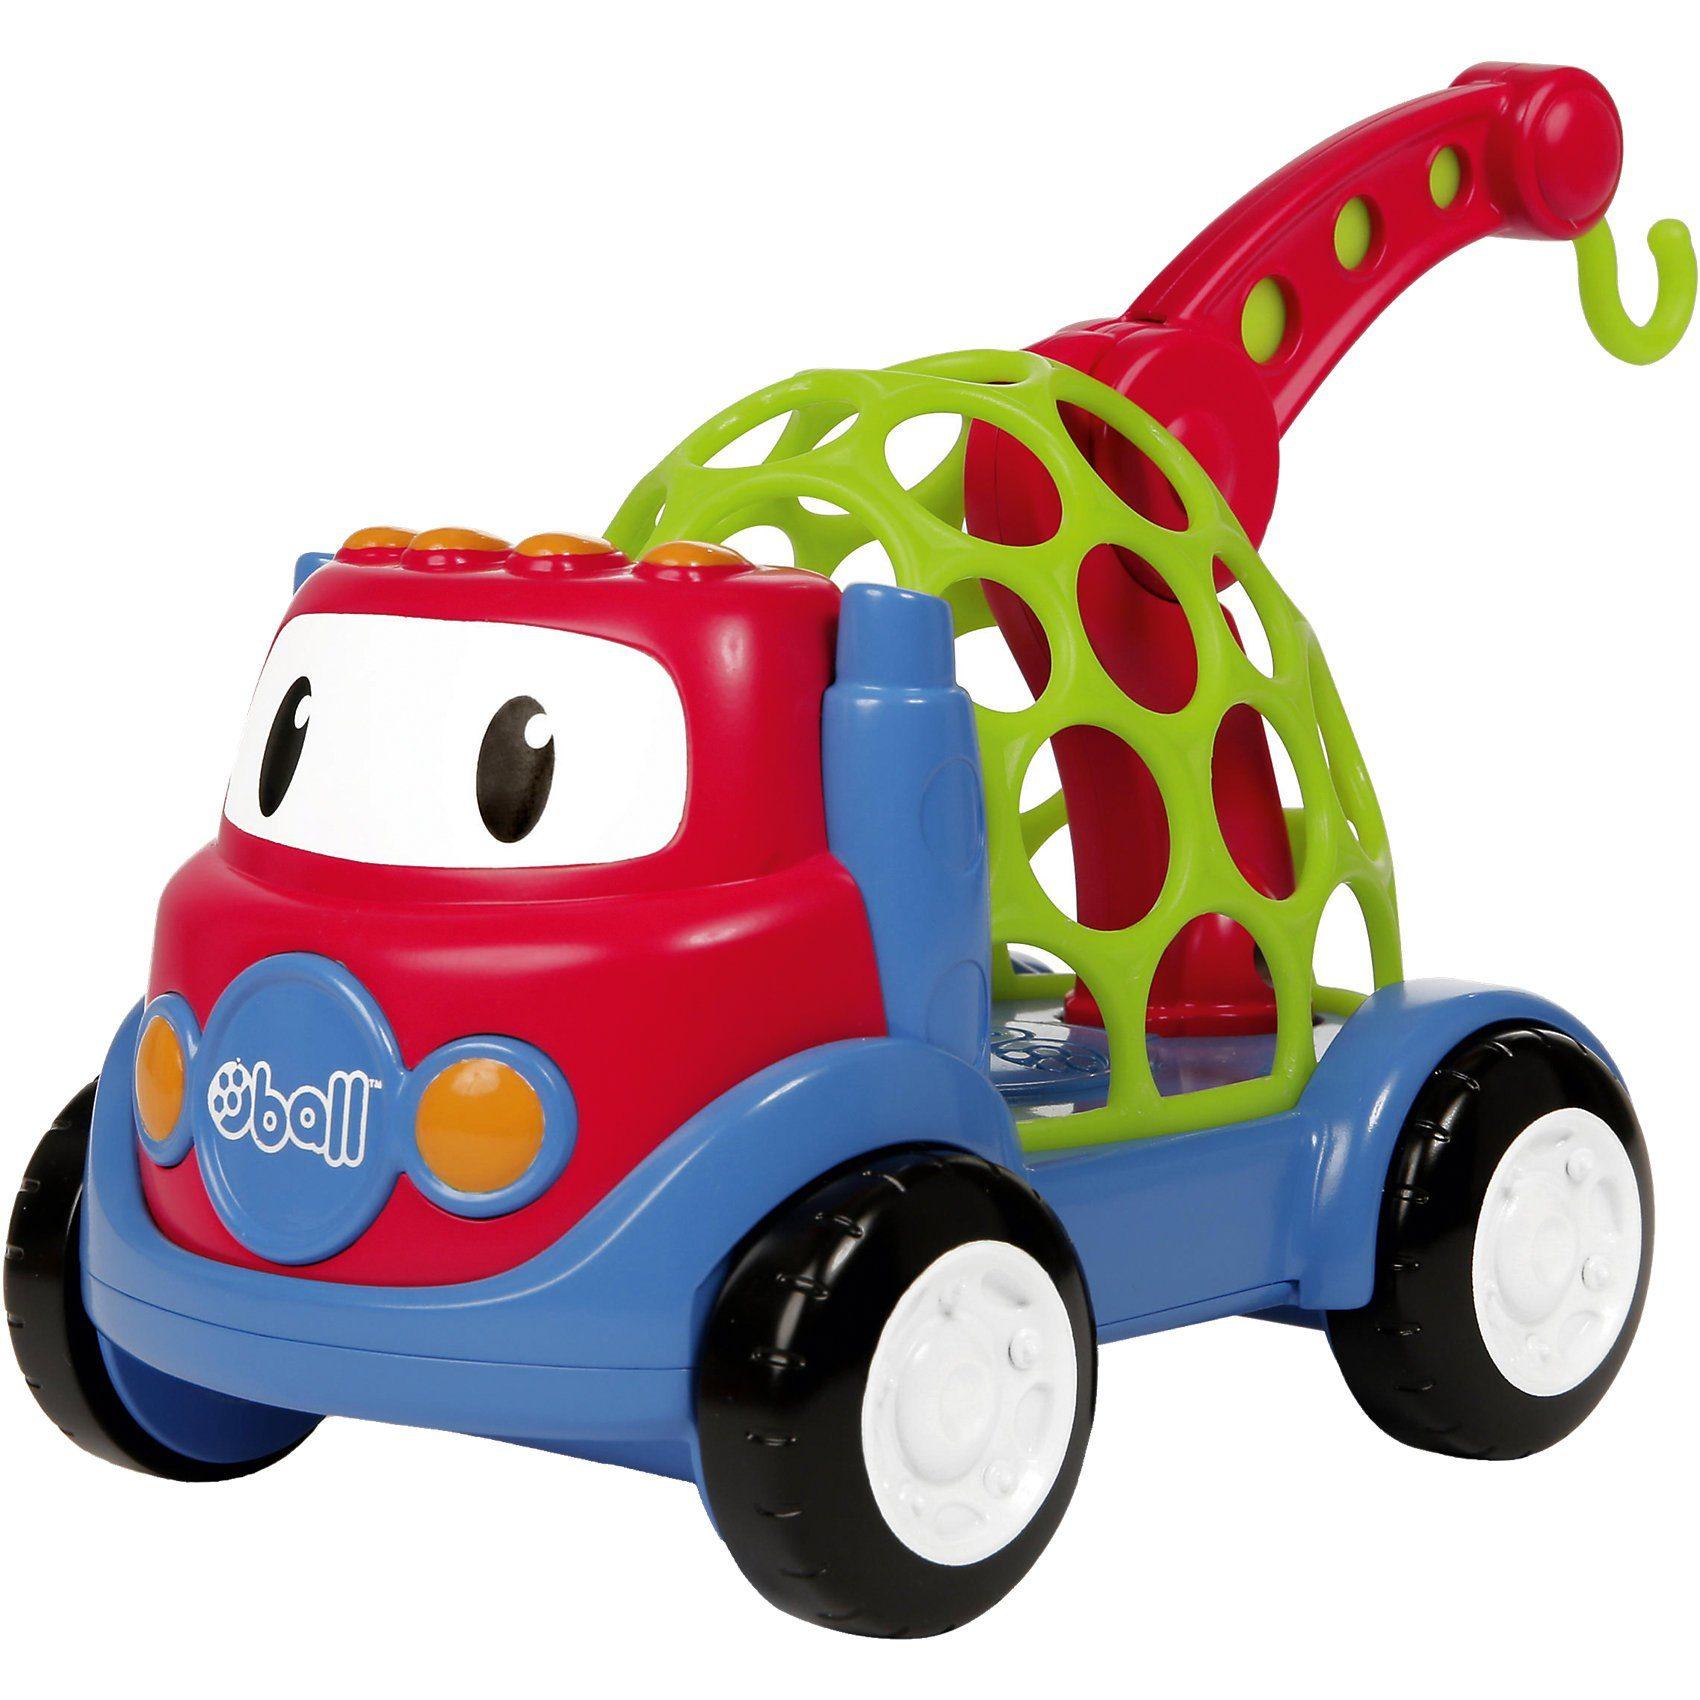 Kids II Oball Go Grippers-Abschleppwagen